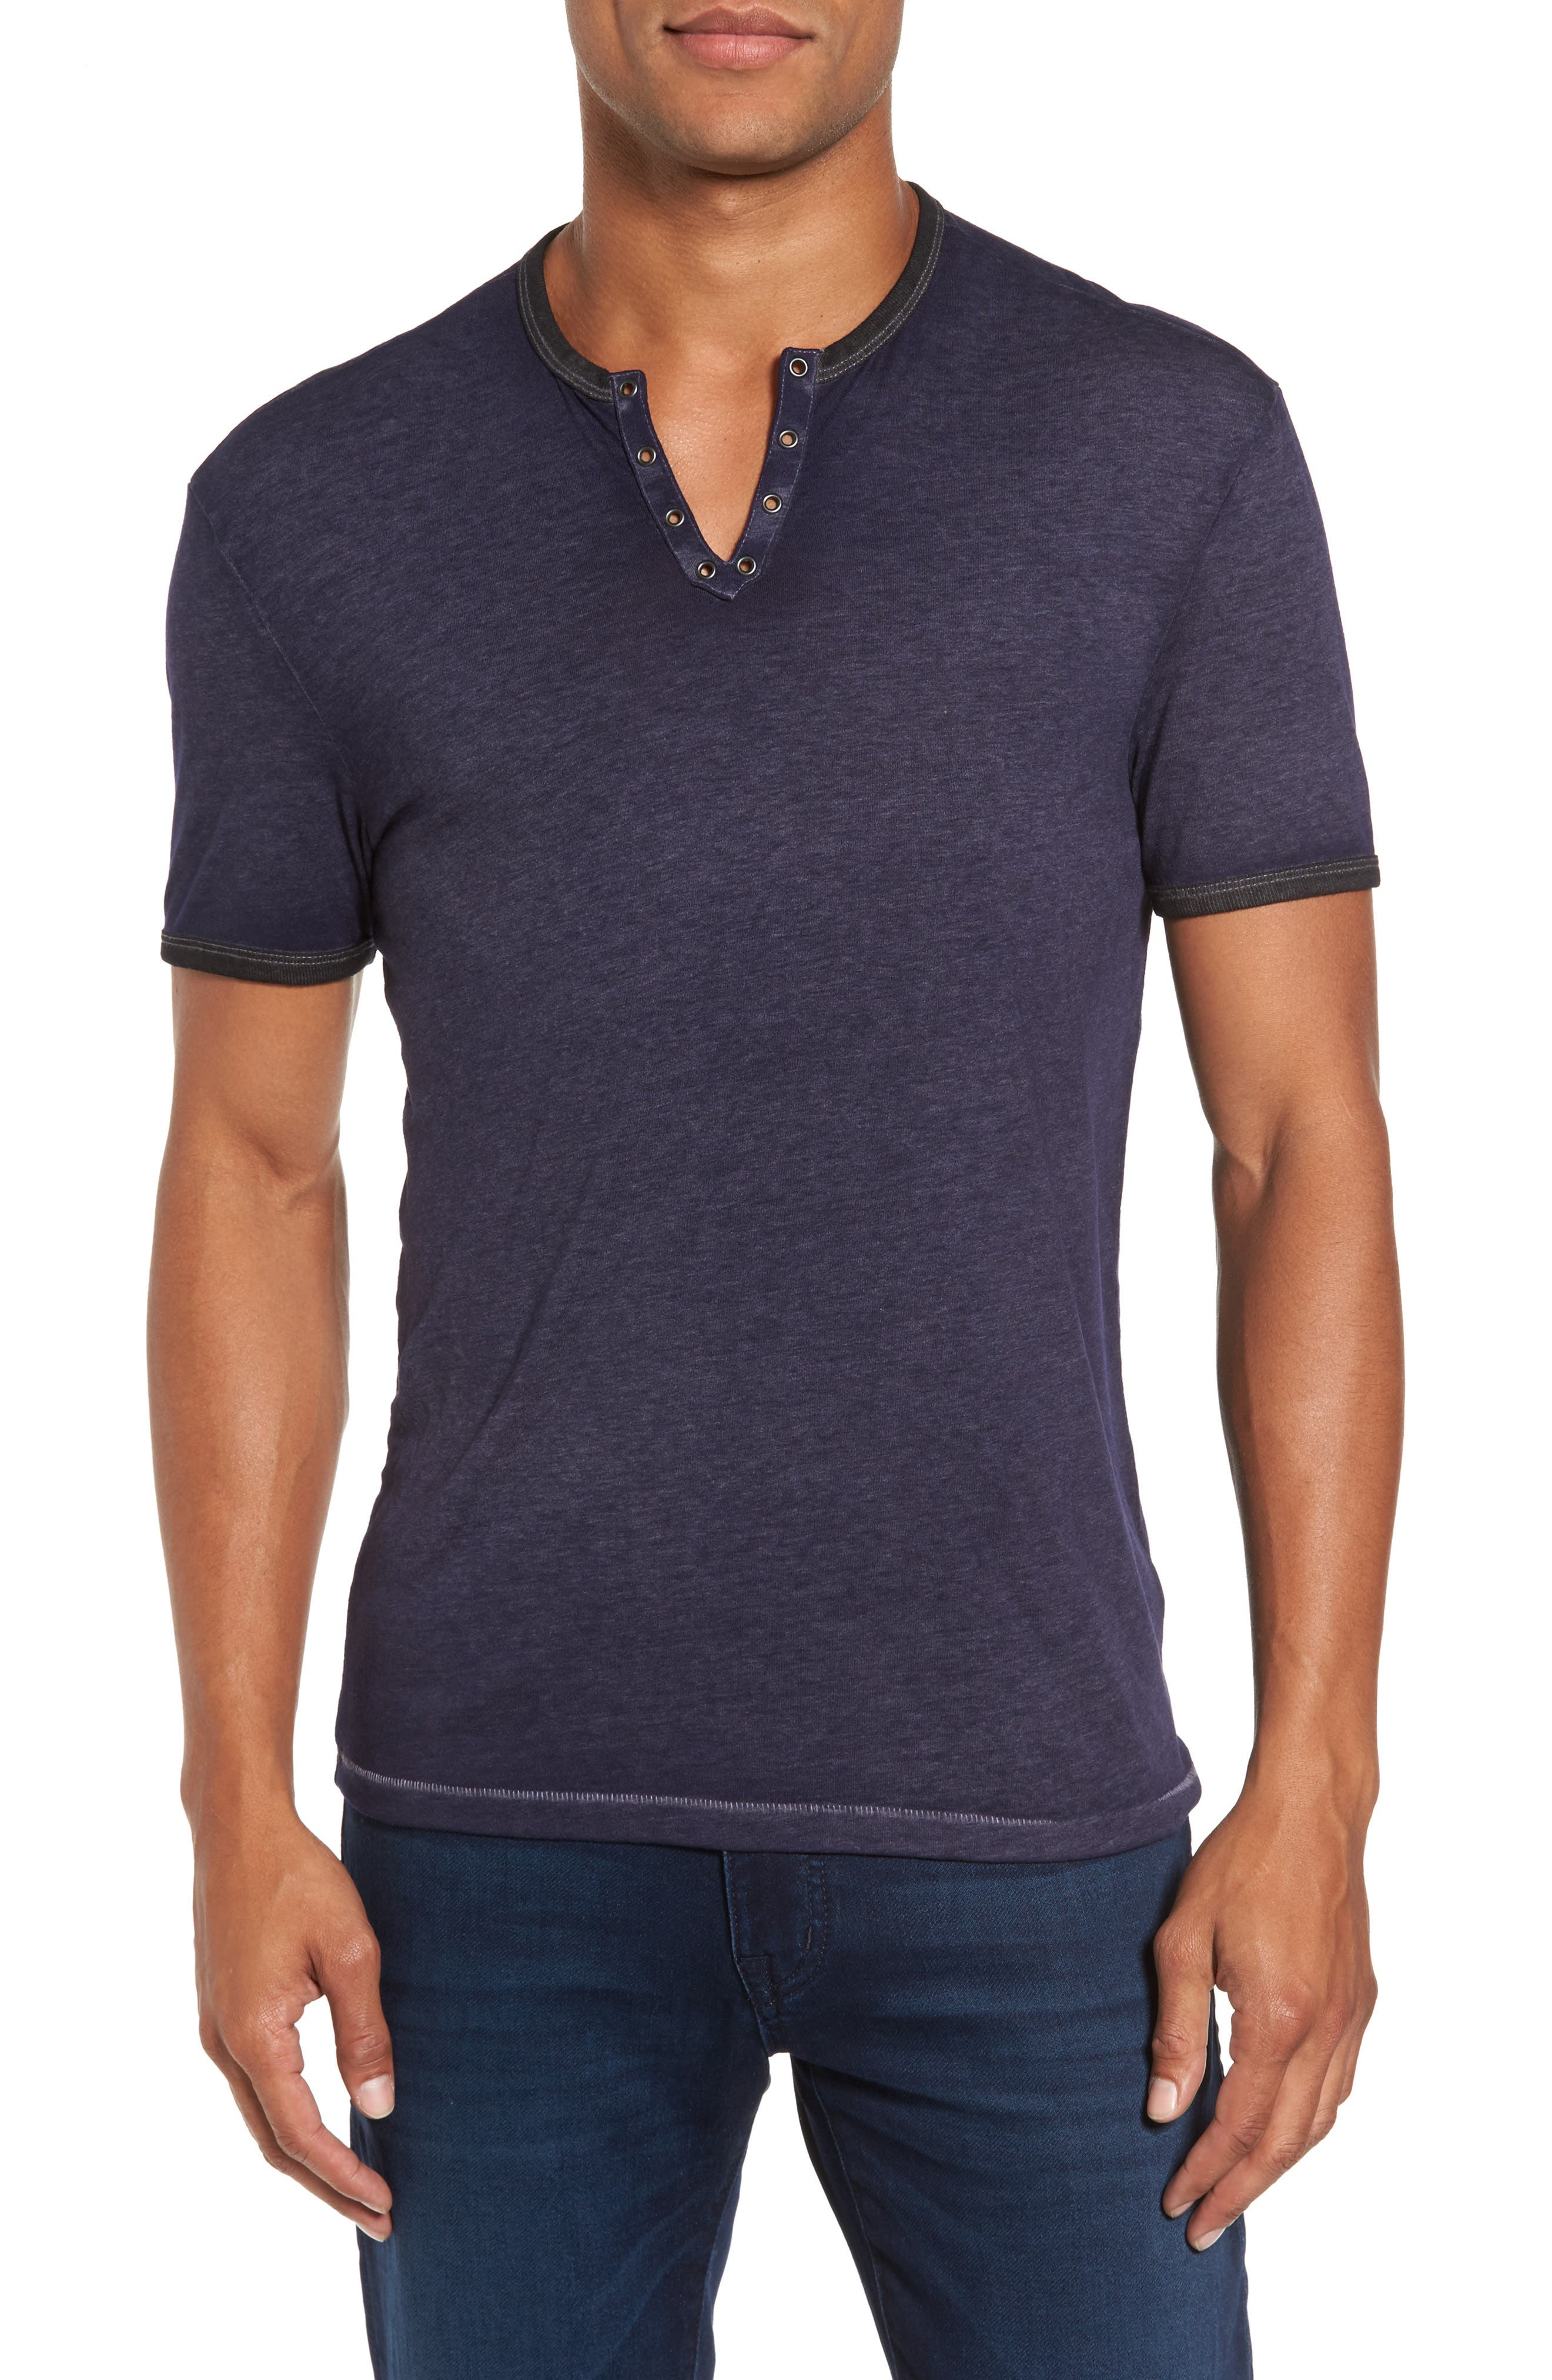 John Varvatos Eyelet Henley T-Shirt